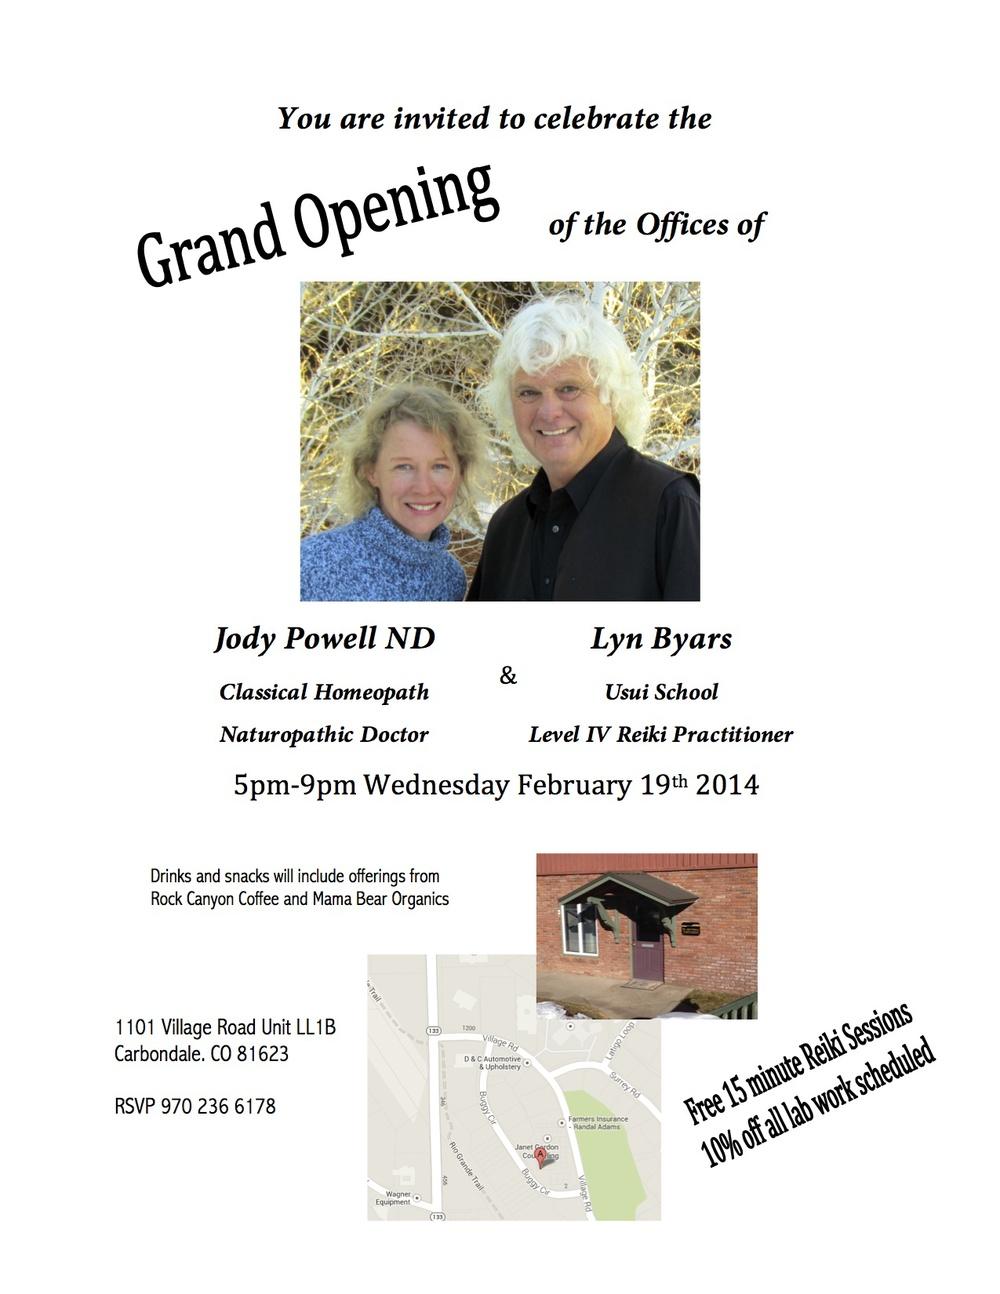 Gran Opening flyer 1101.jpg